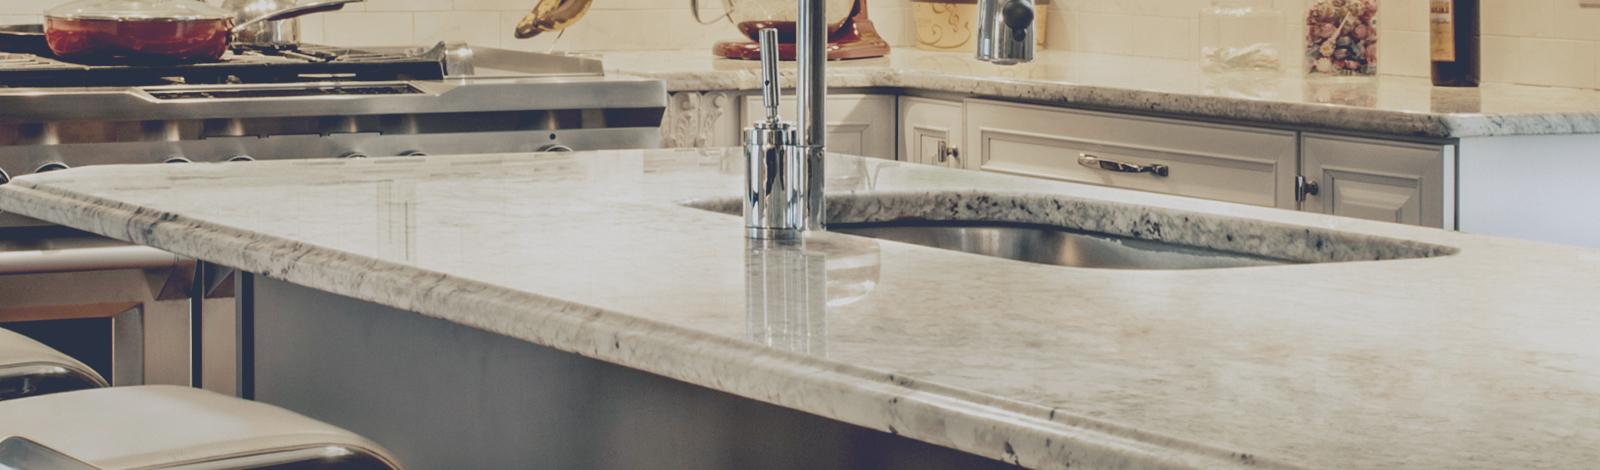 comptoir de cuisine et vanit en granite fabrique plus. Black Bedroom Furniture Sets. Home Design Ideas